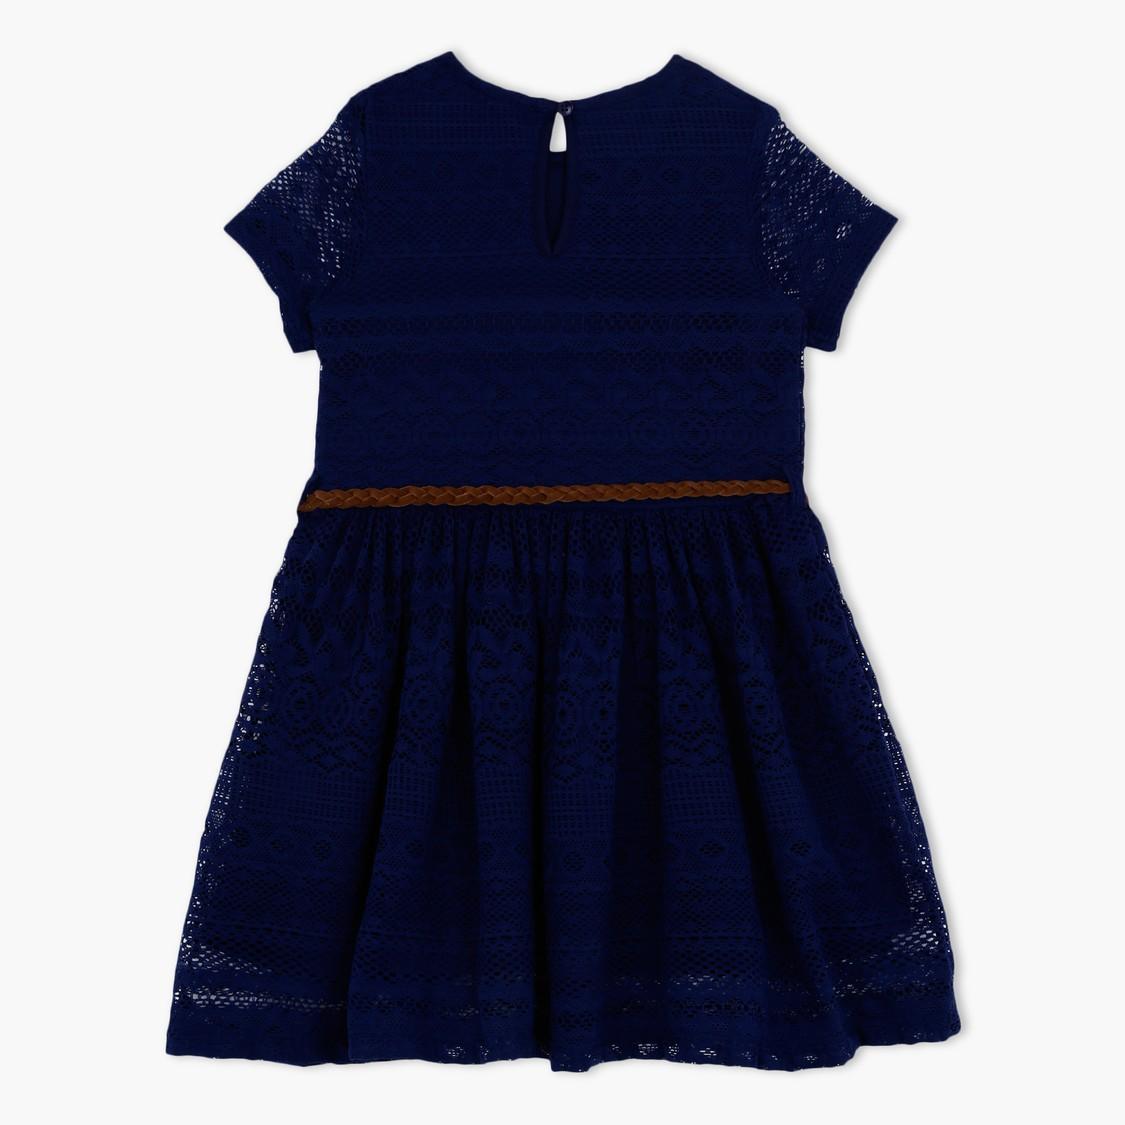 Round Neck Short Sleeves Dress